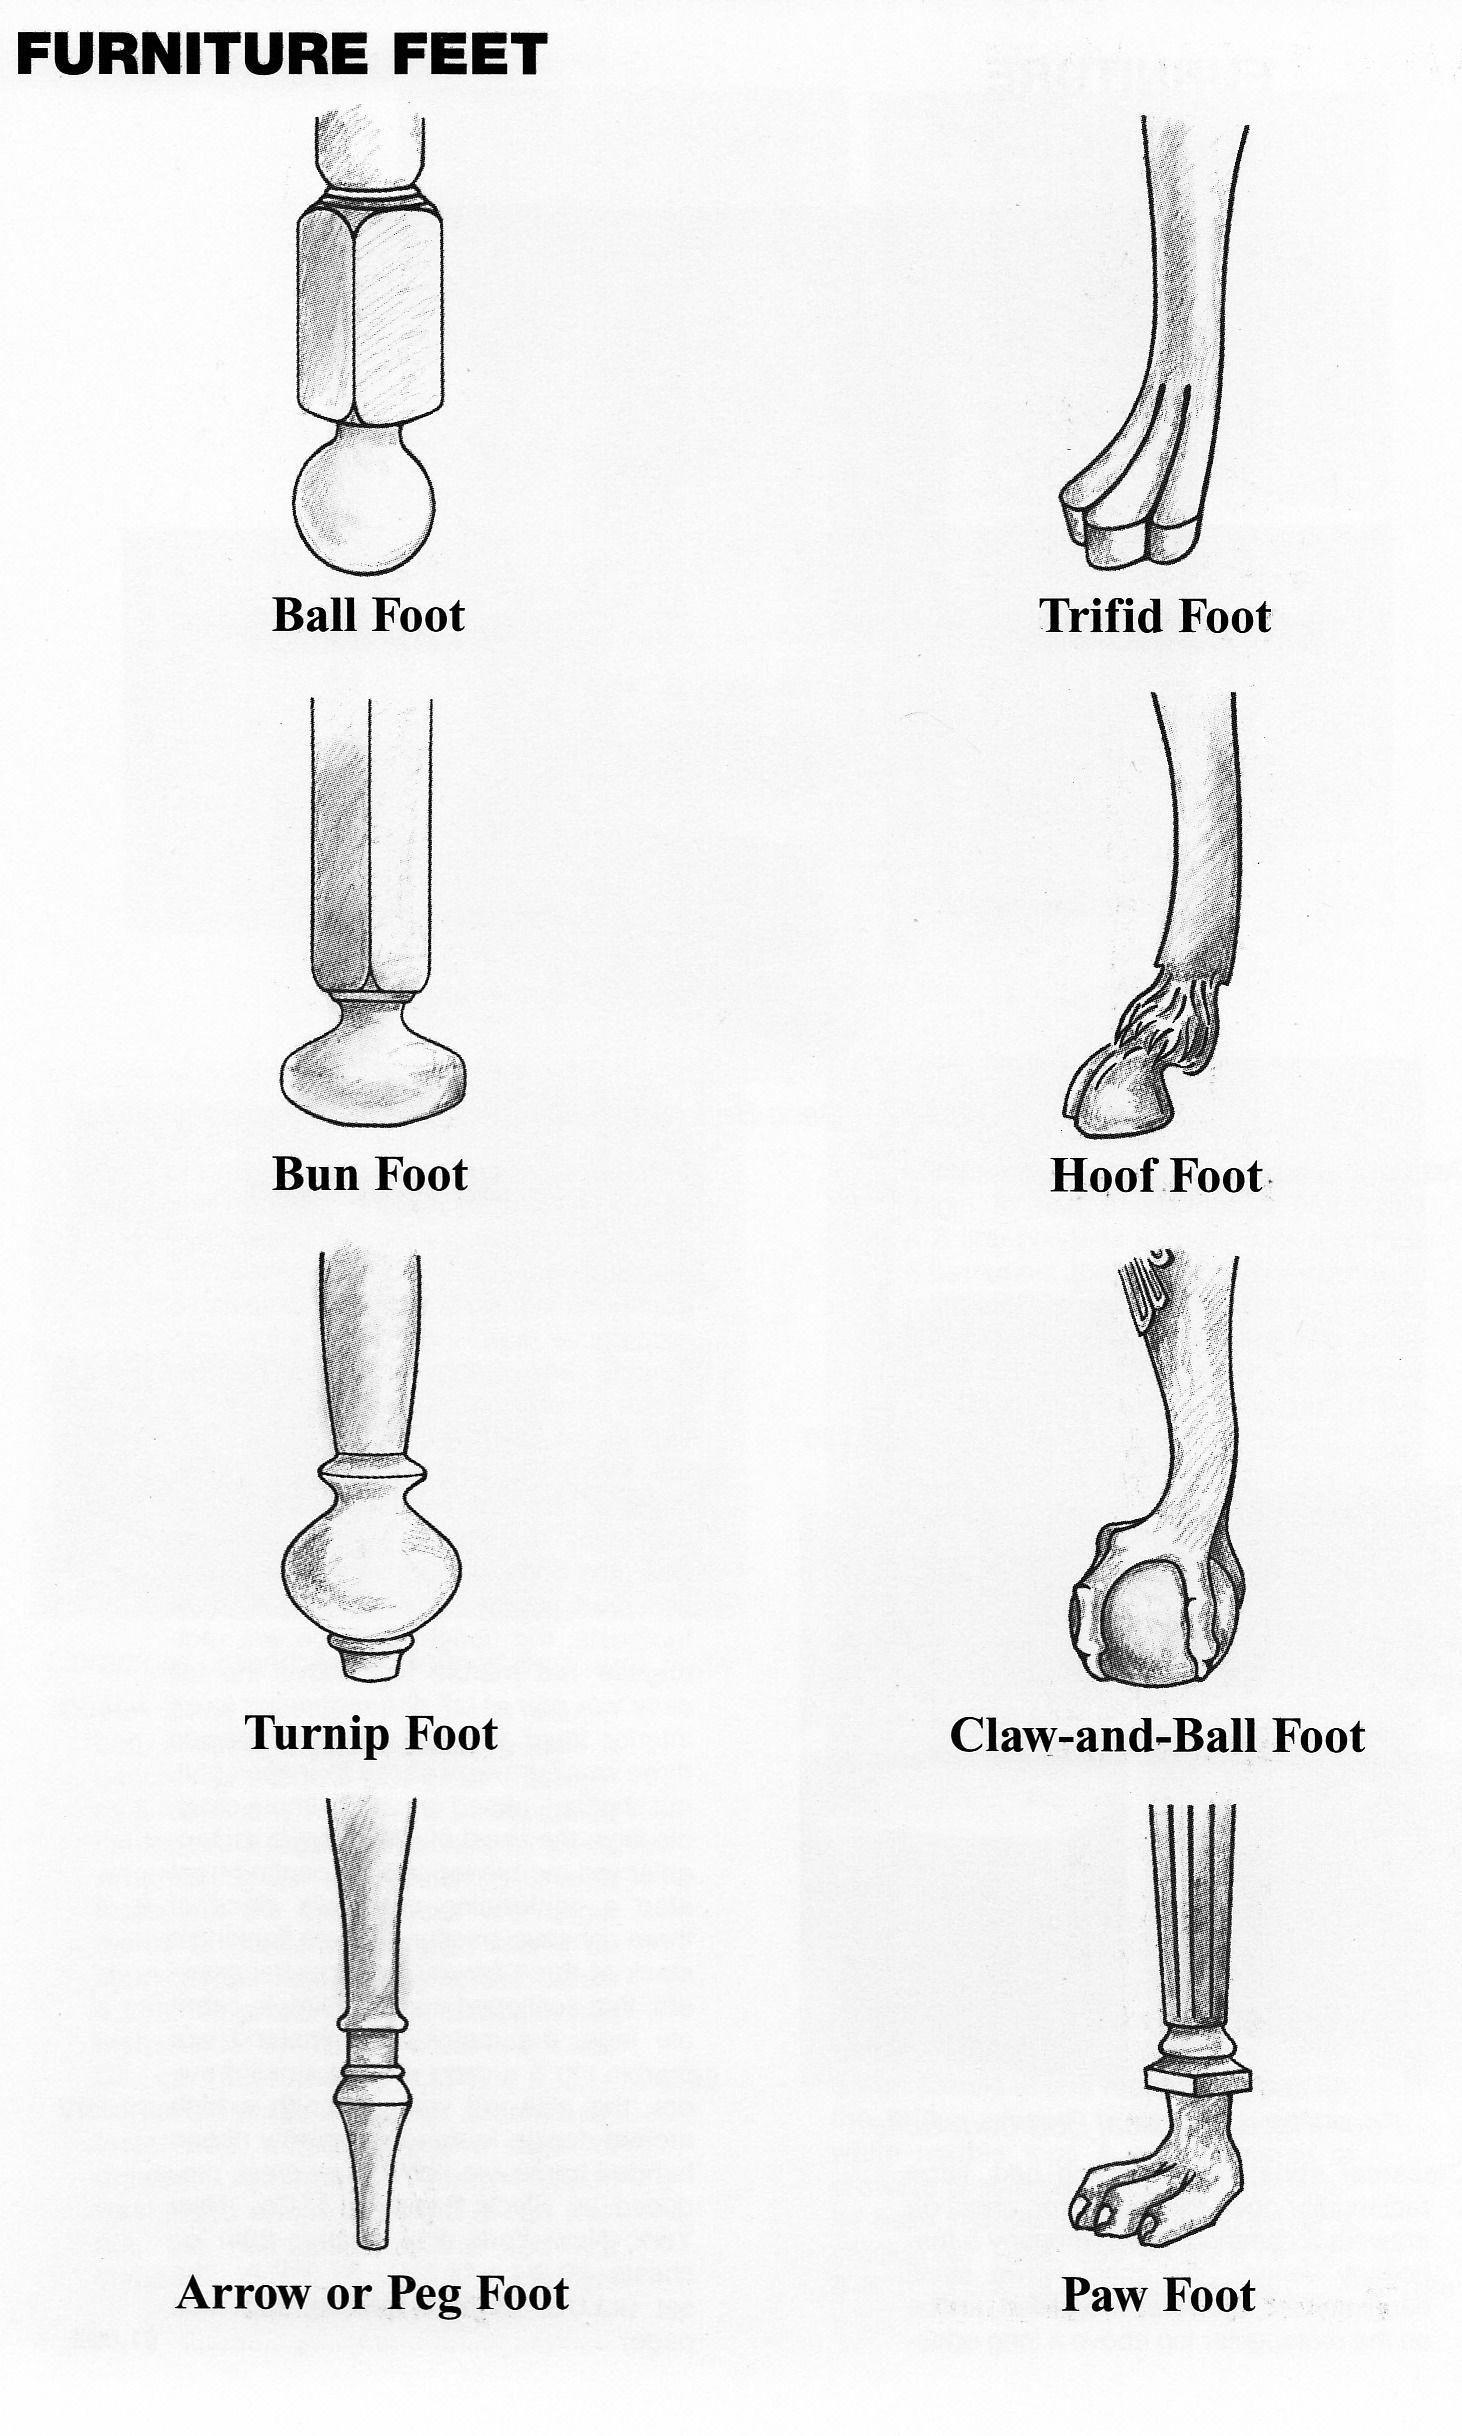 Diagrams Of Furniture Feet Antiquefurnitureforsale